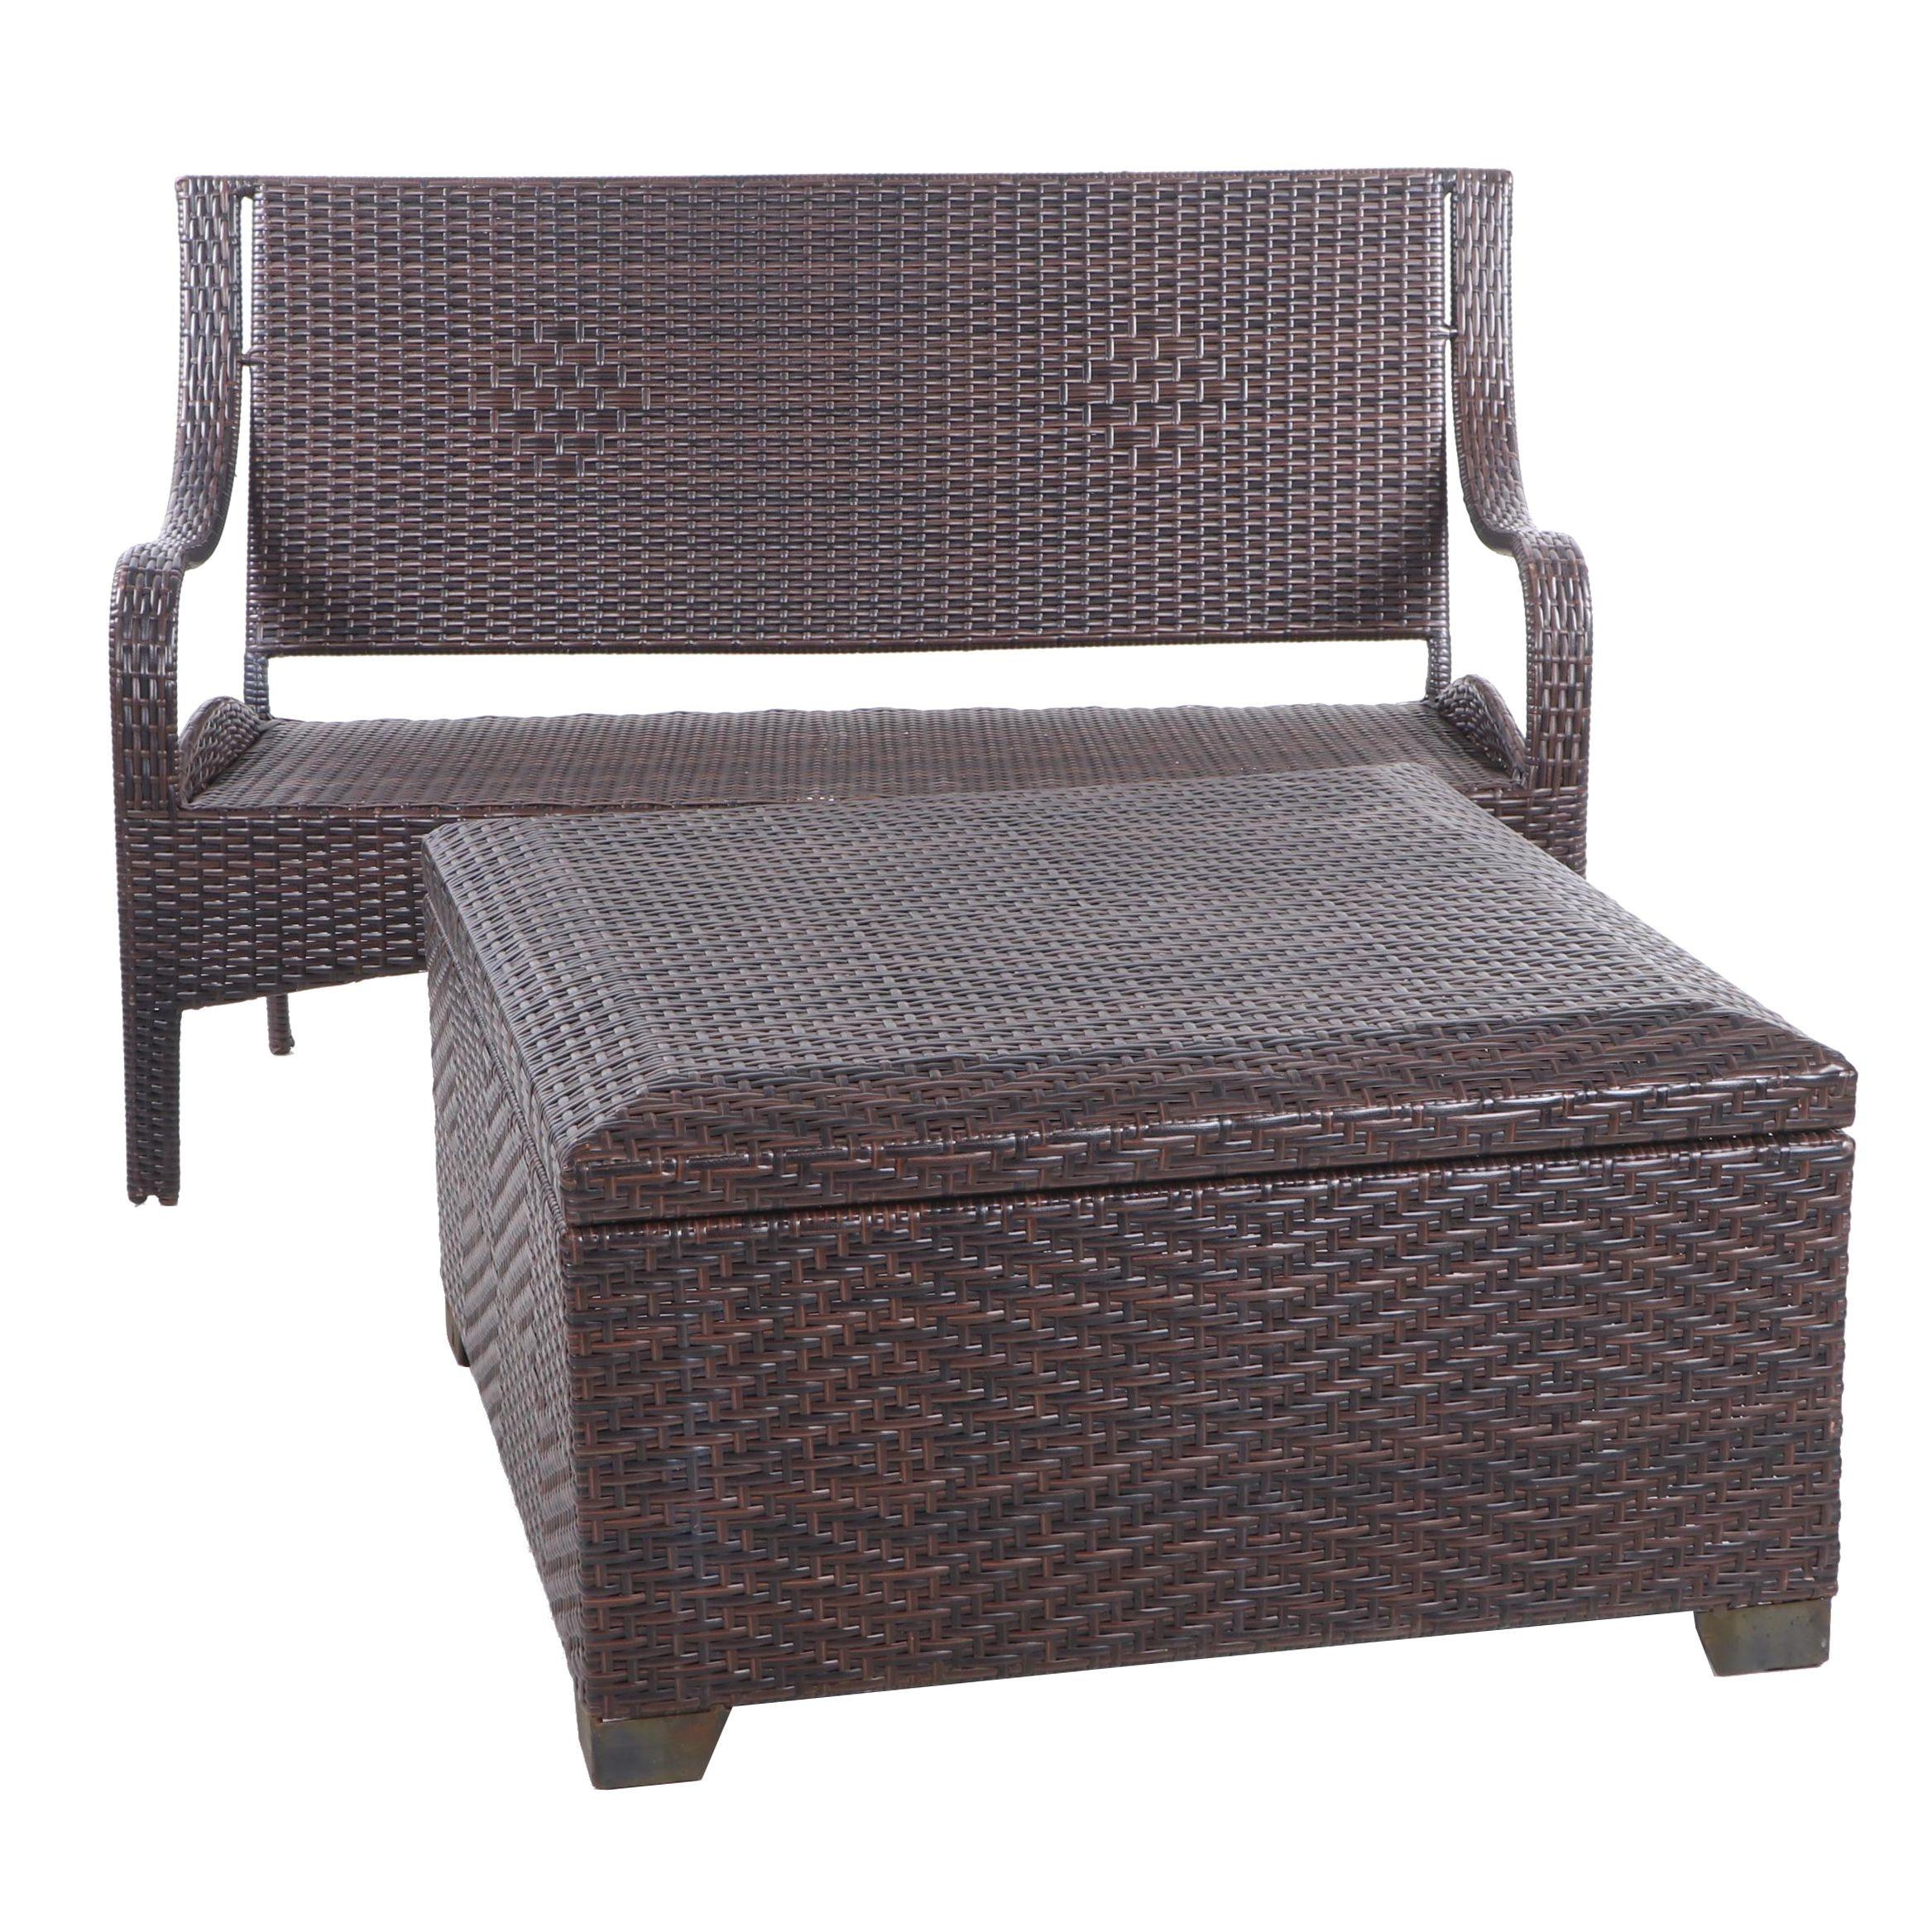 Contemporary Wicker Patio Bench and Storage Ottoman